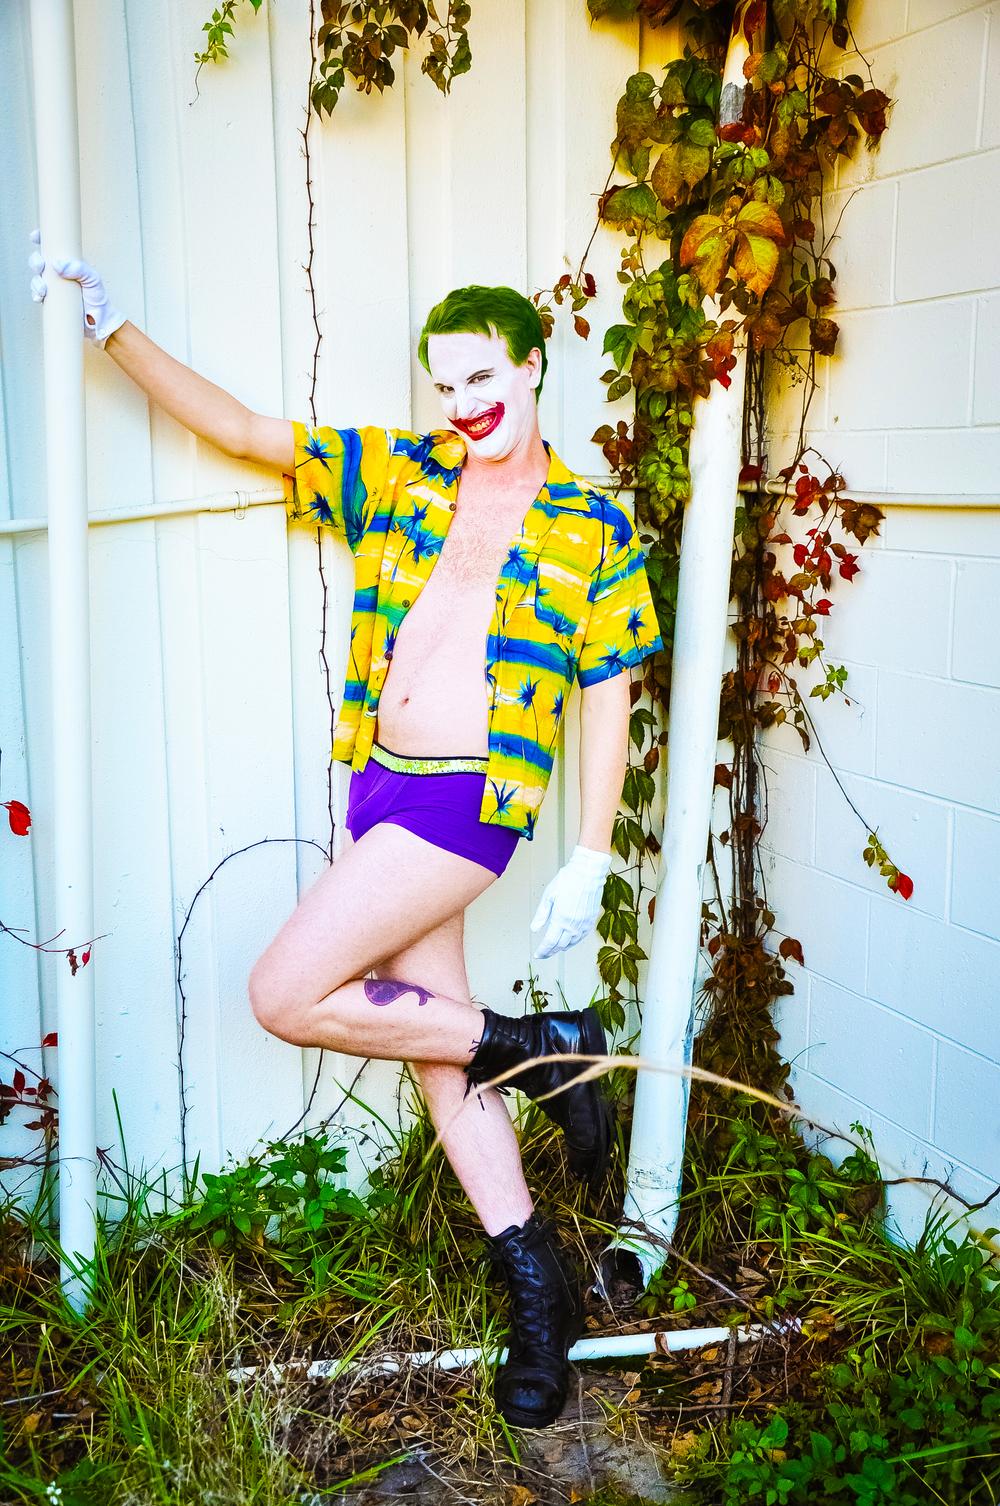 Joker Without eyebrows.jpg